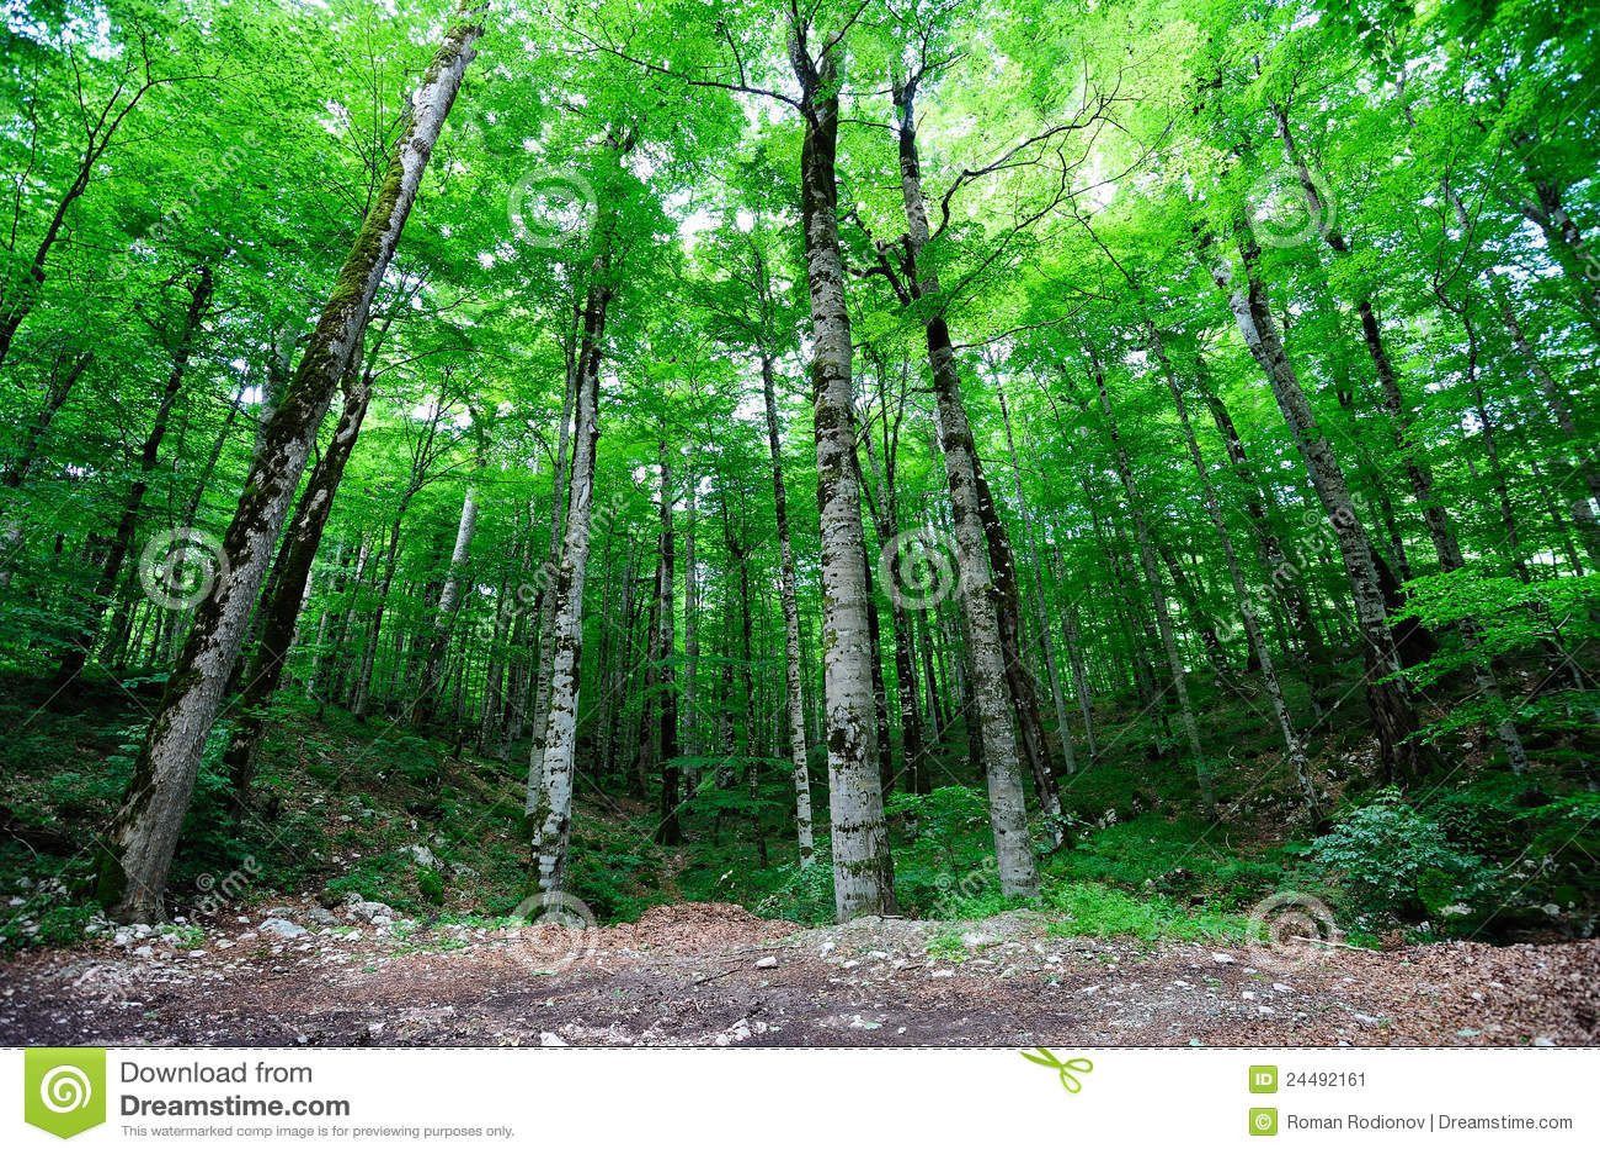 Fall Coastal Desktop Wallpaper Bright Green Forest Stock Image Image 24492161